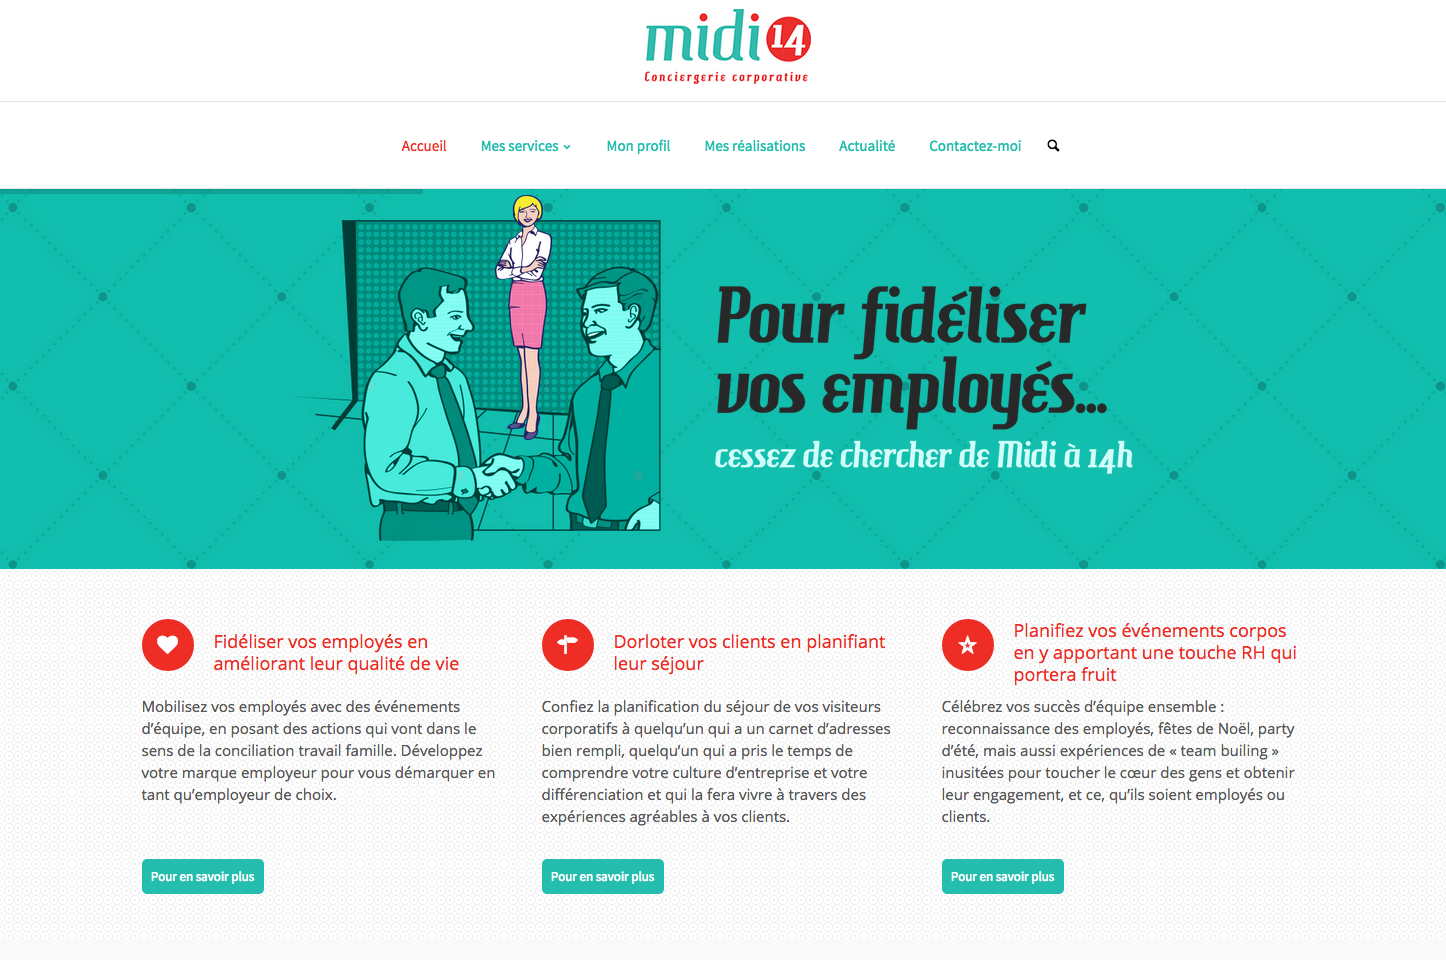 Page d'accueil Midi14.com